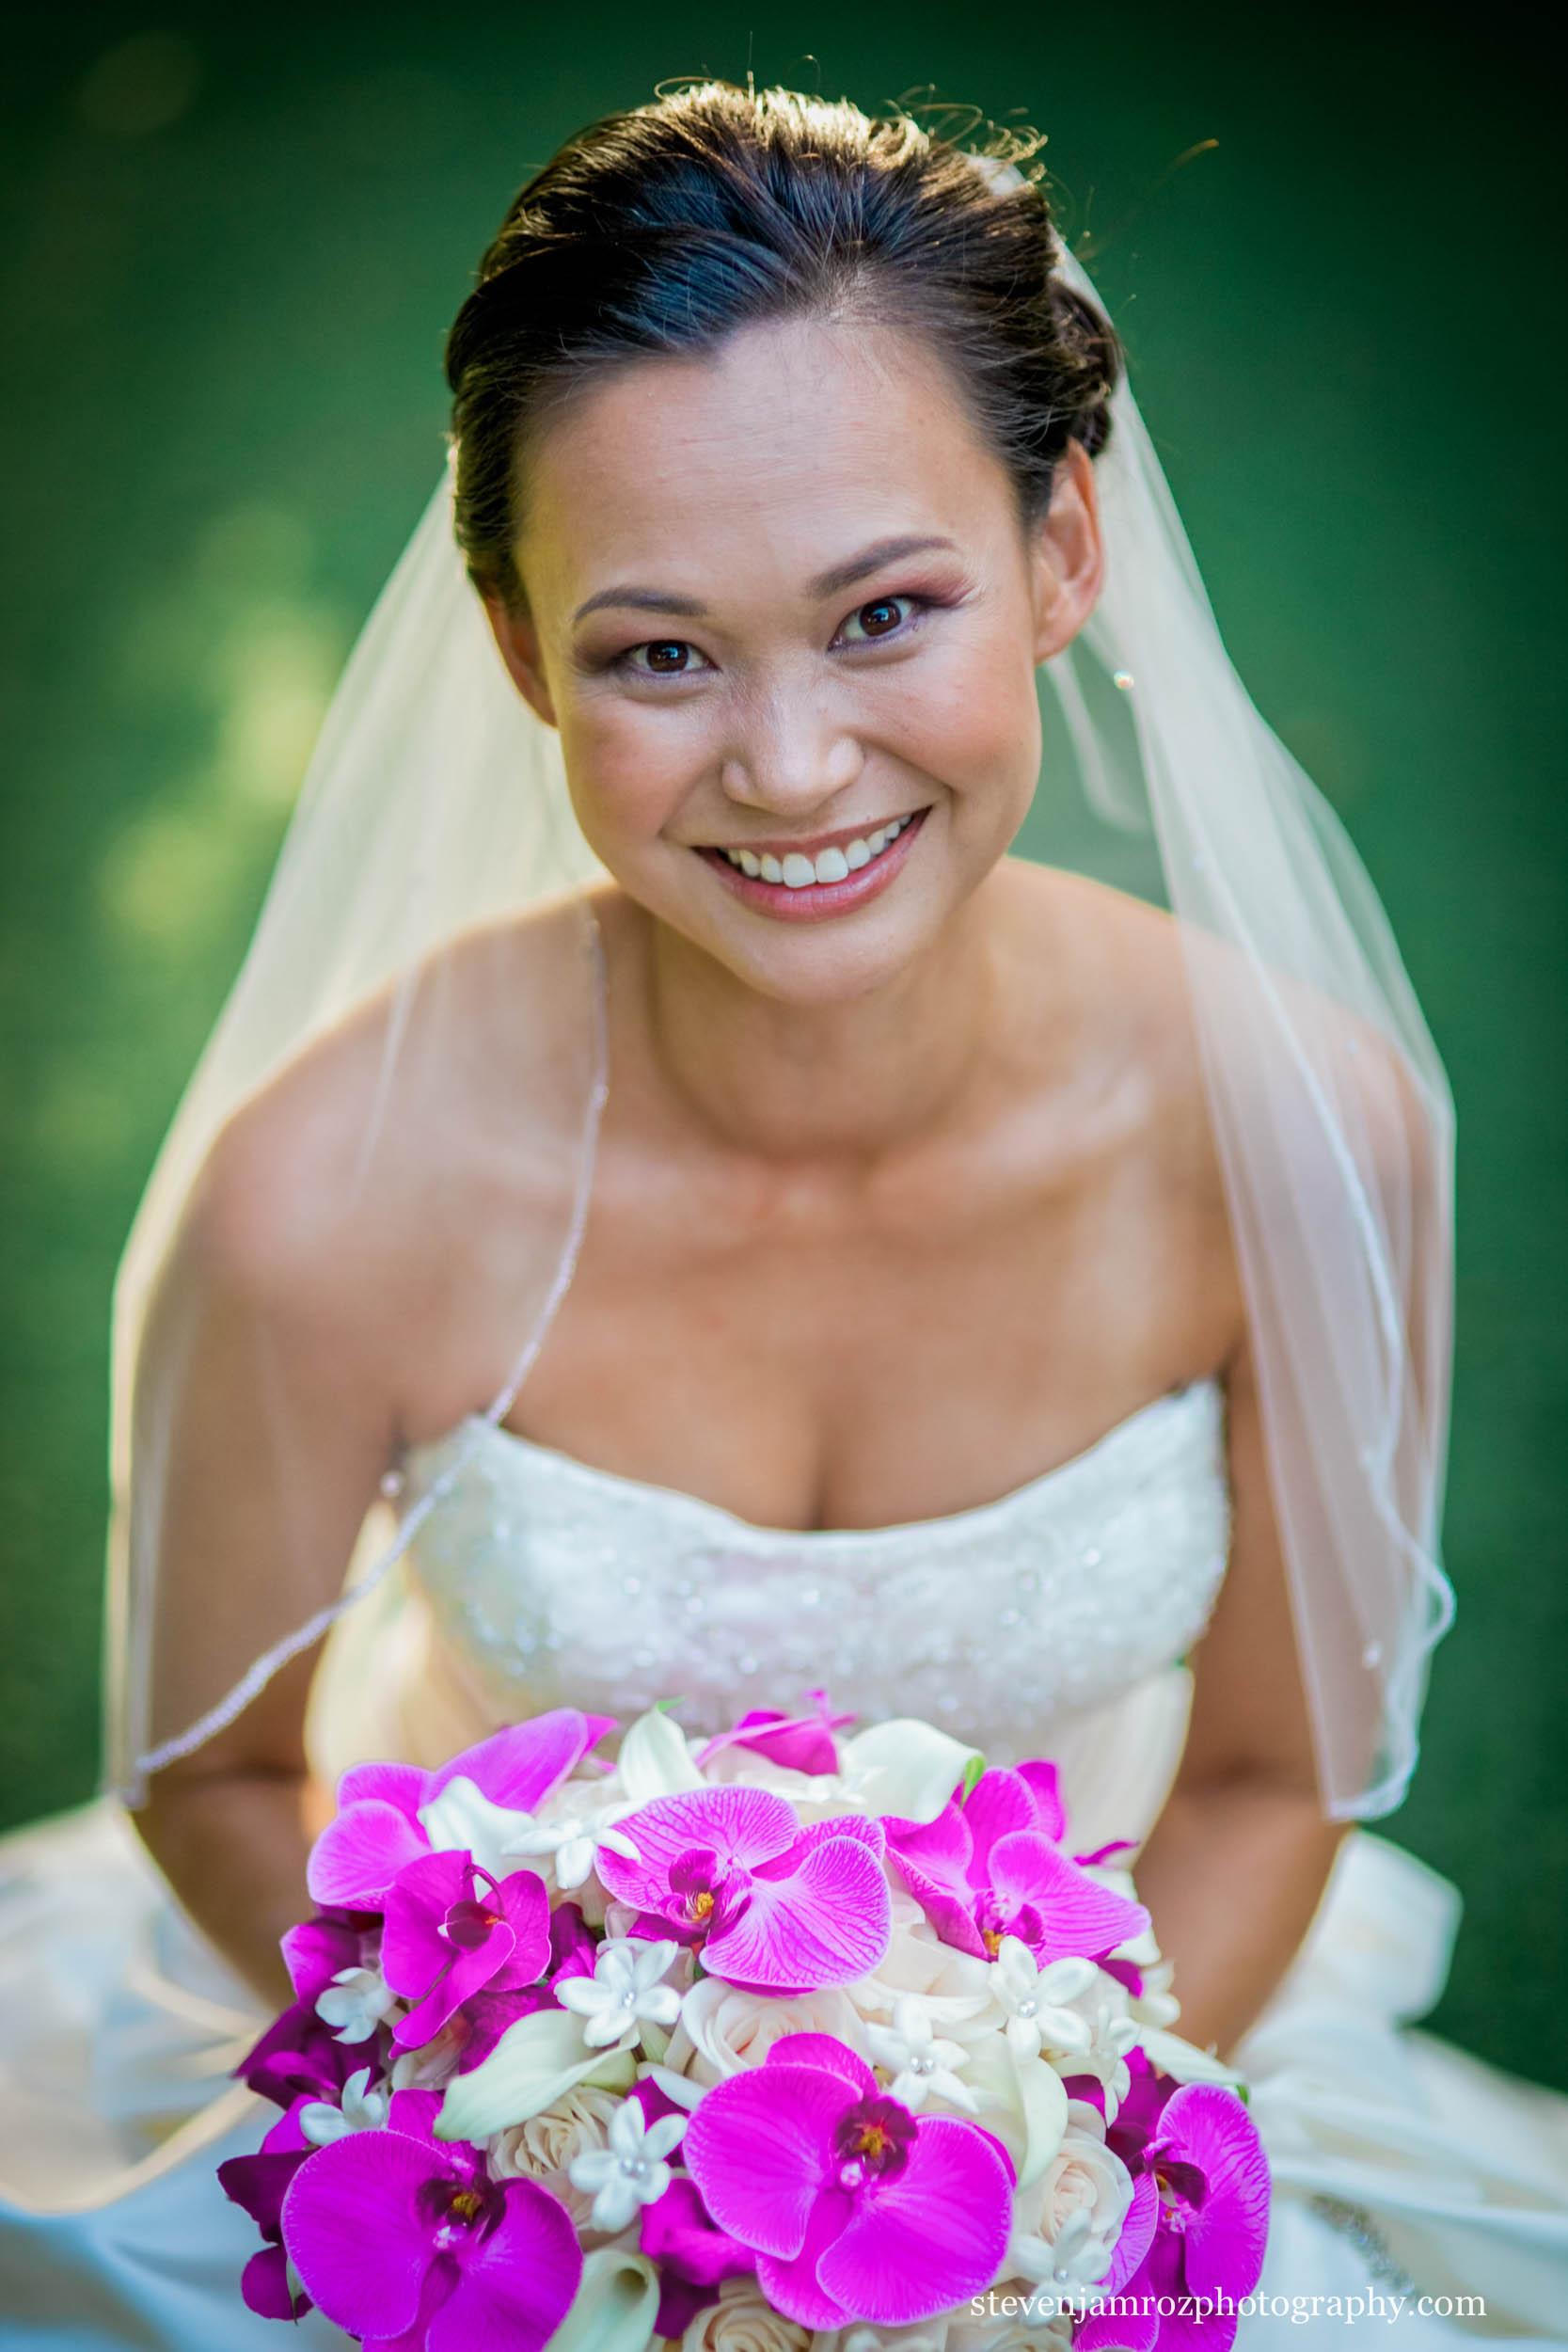 apex-nc-wedding-steven-jamroz-photography-0632.jpg